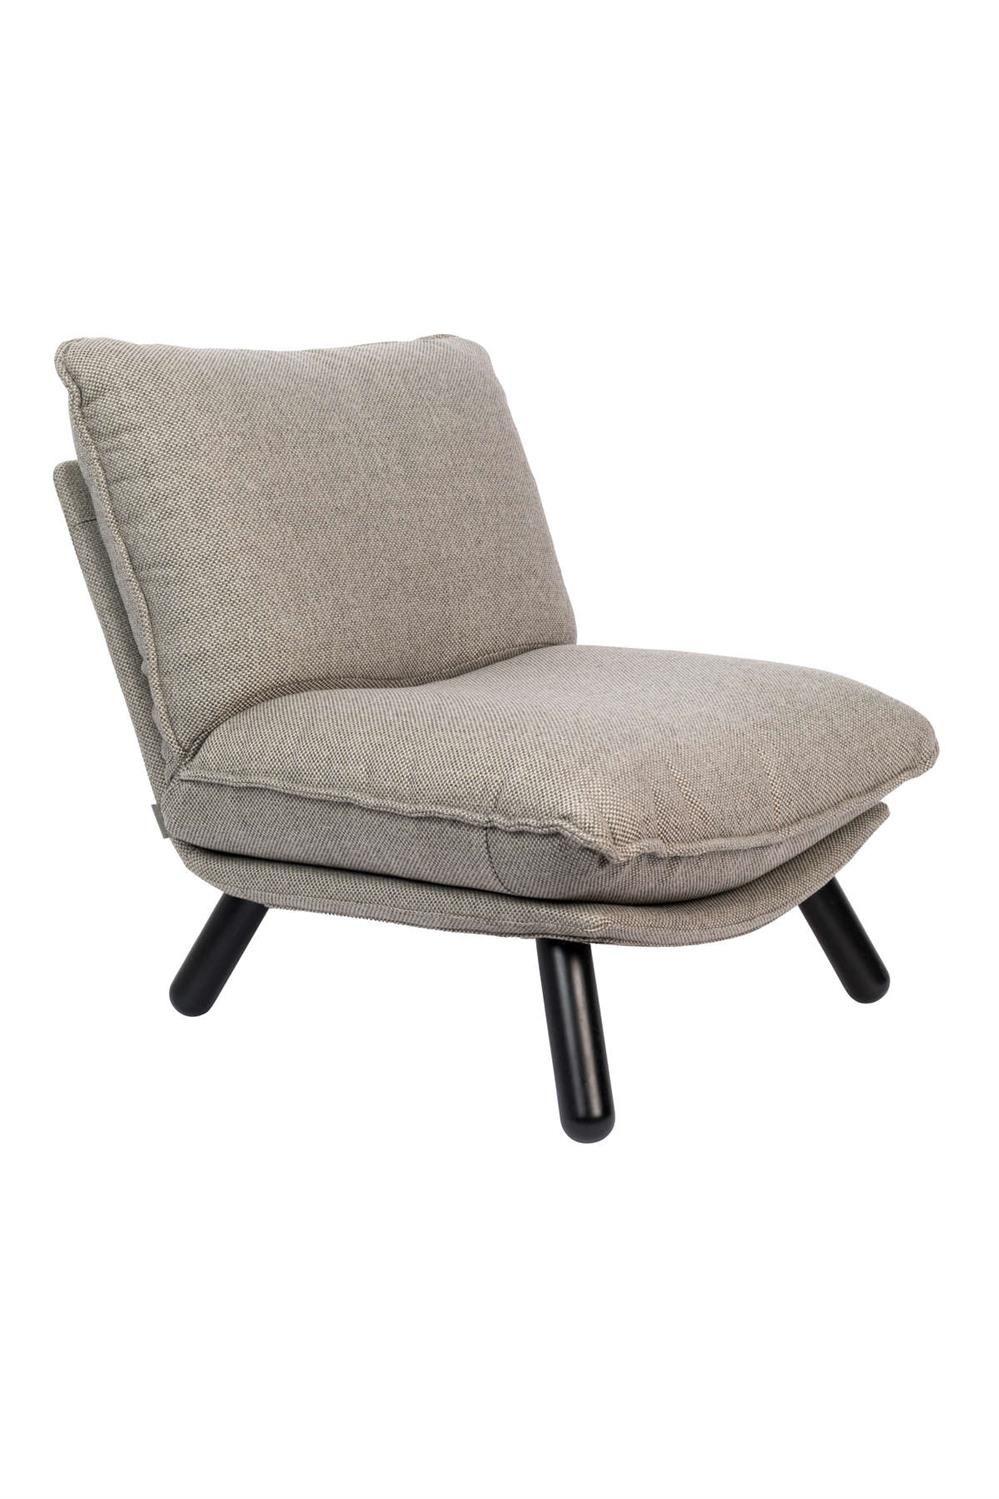 Fotel lounge LAZY SACK jasnogrey